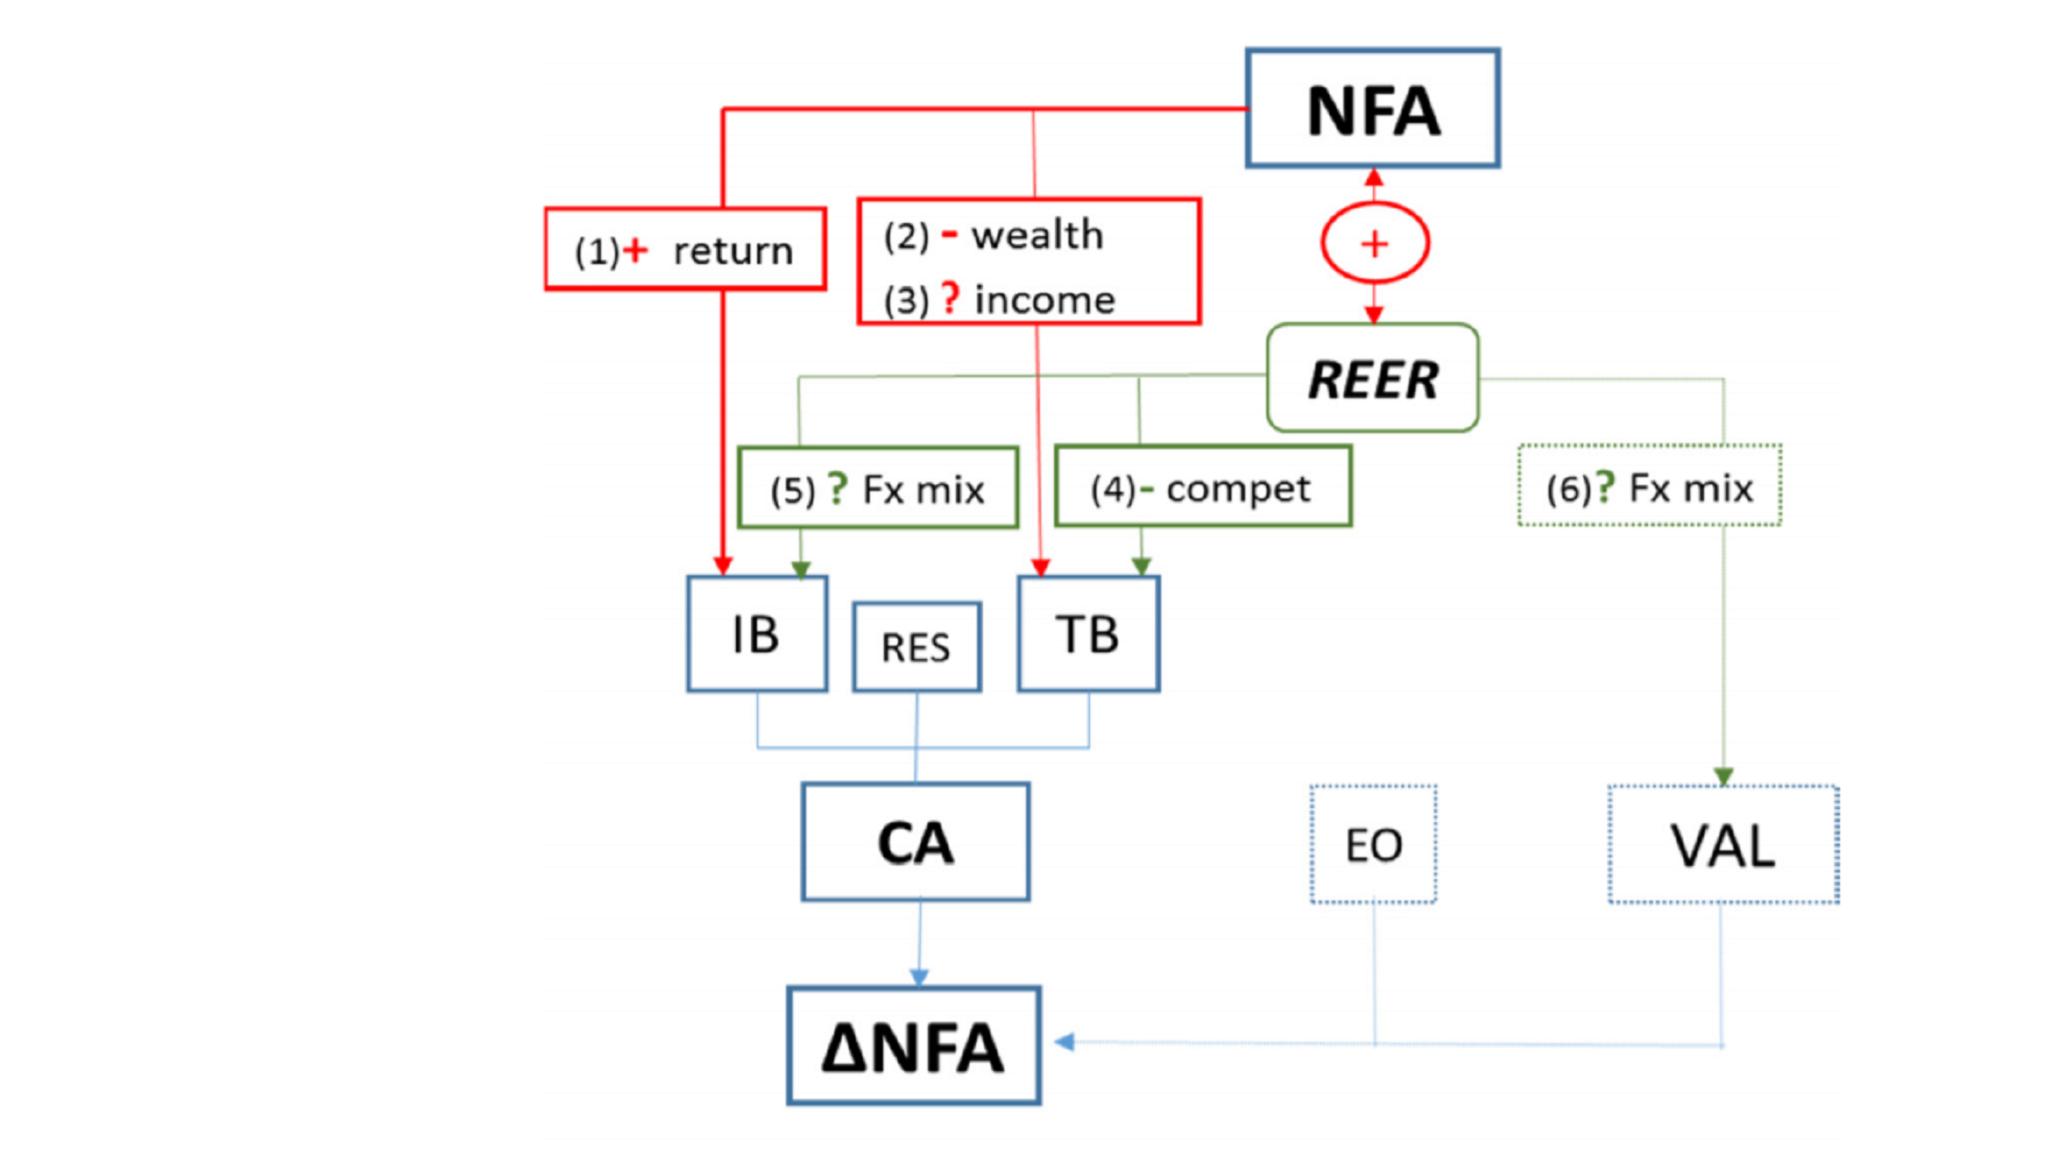 BIS-nfa-flowchart-featured.png